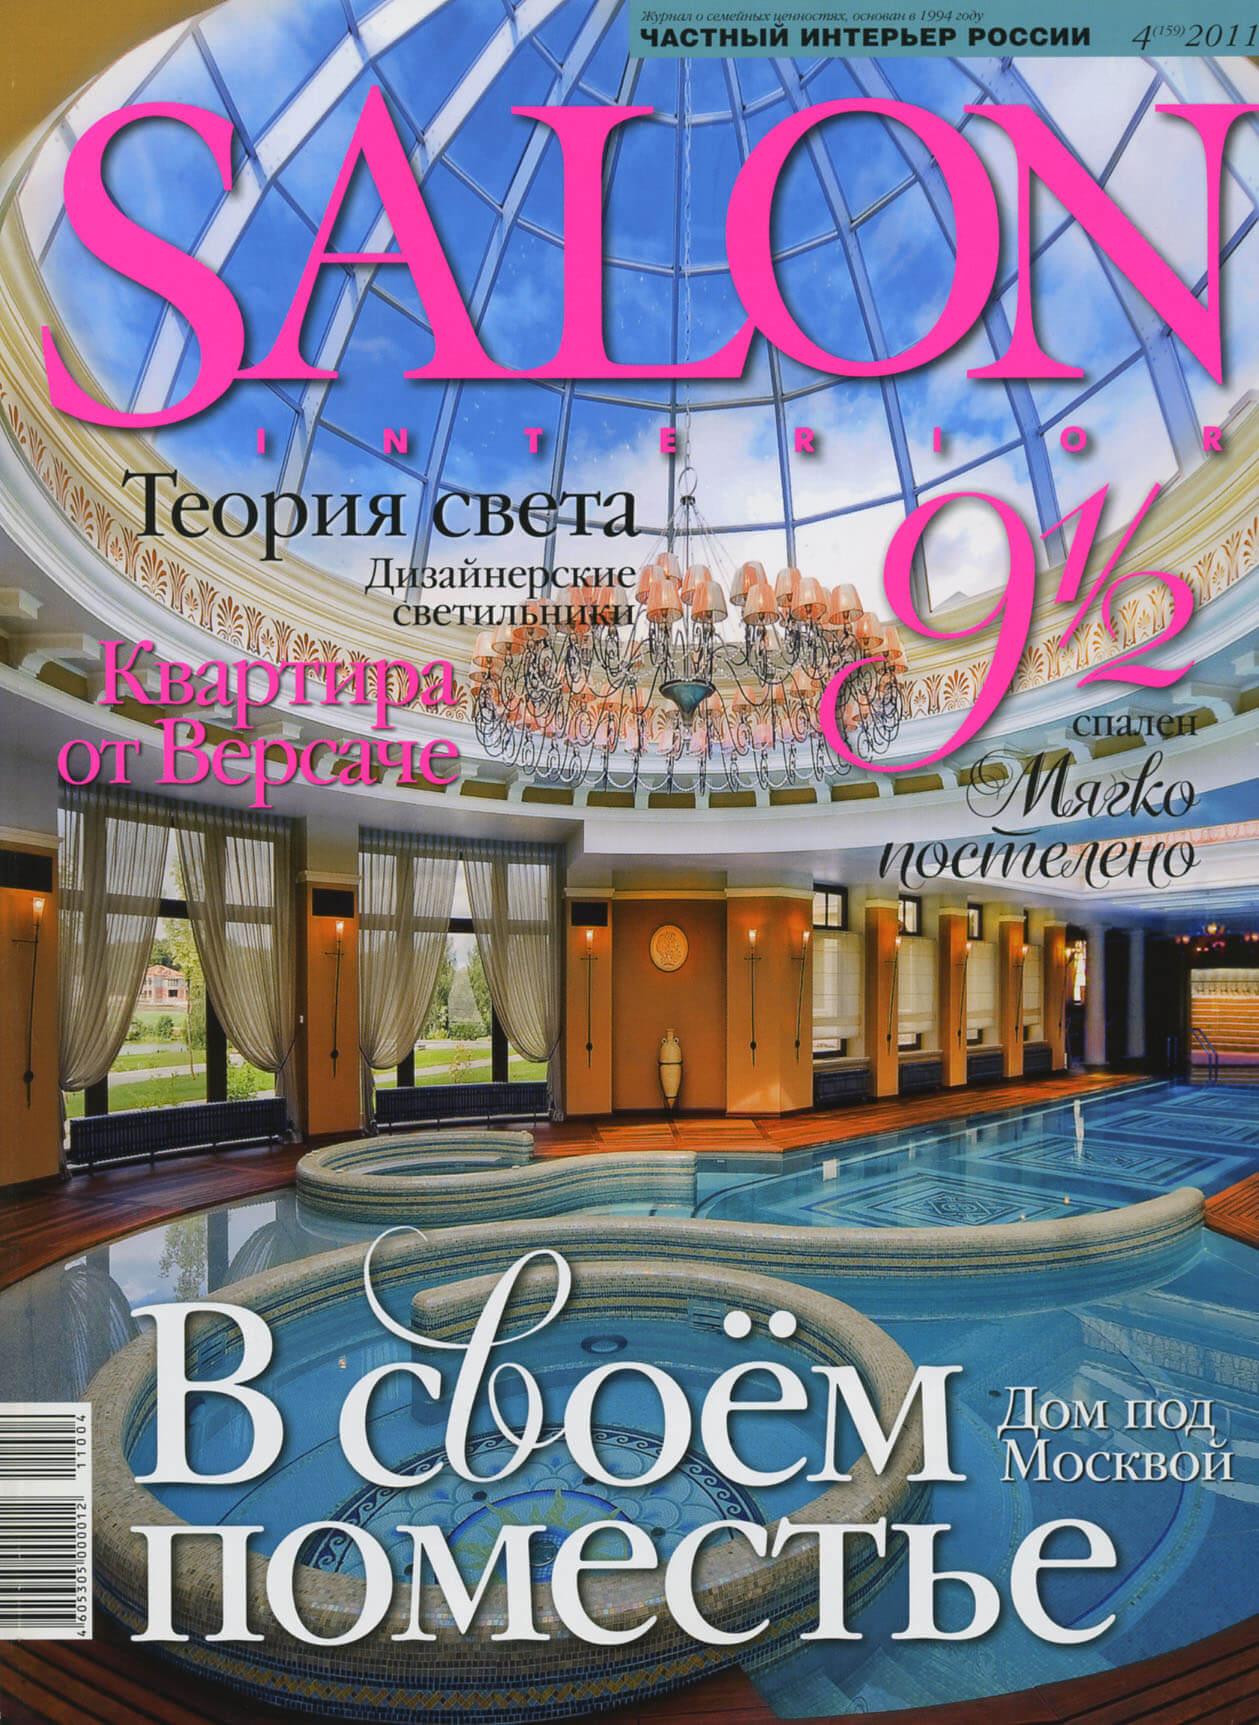 Salon 4 (159) 2011